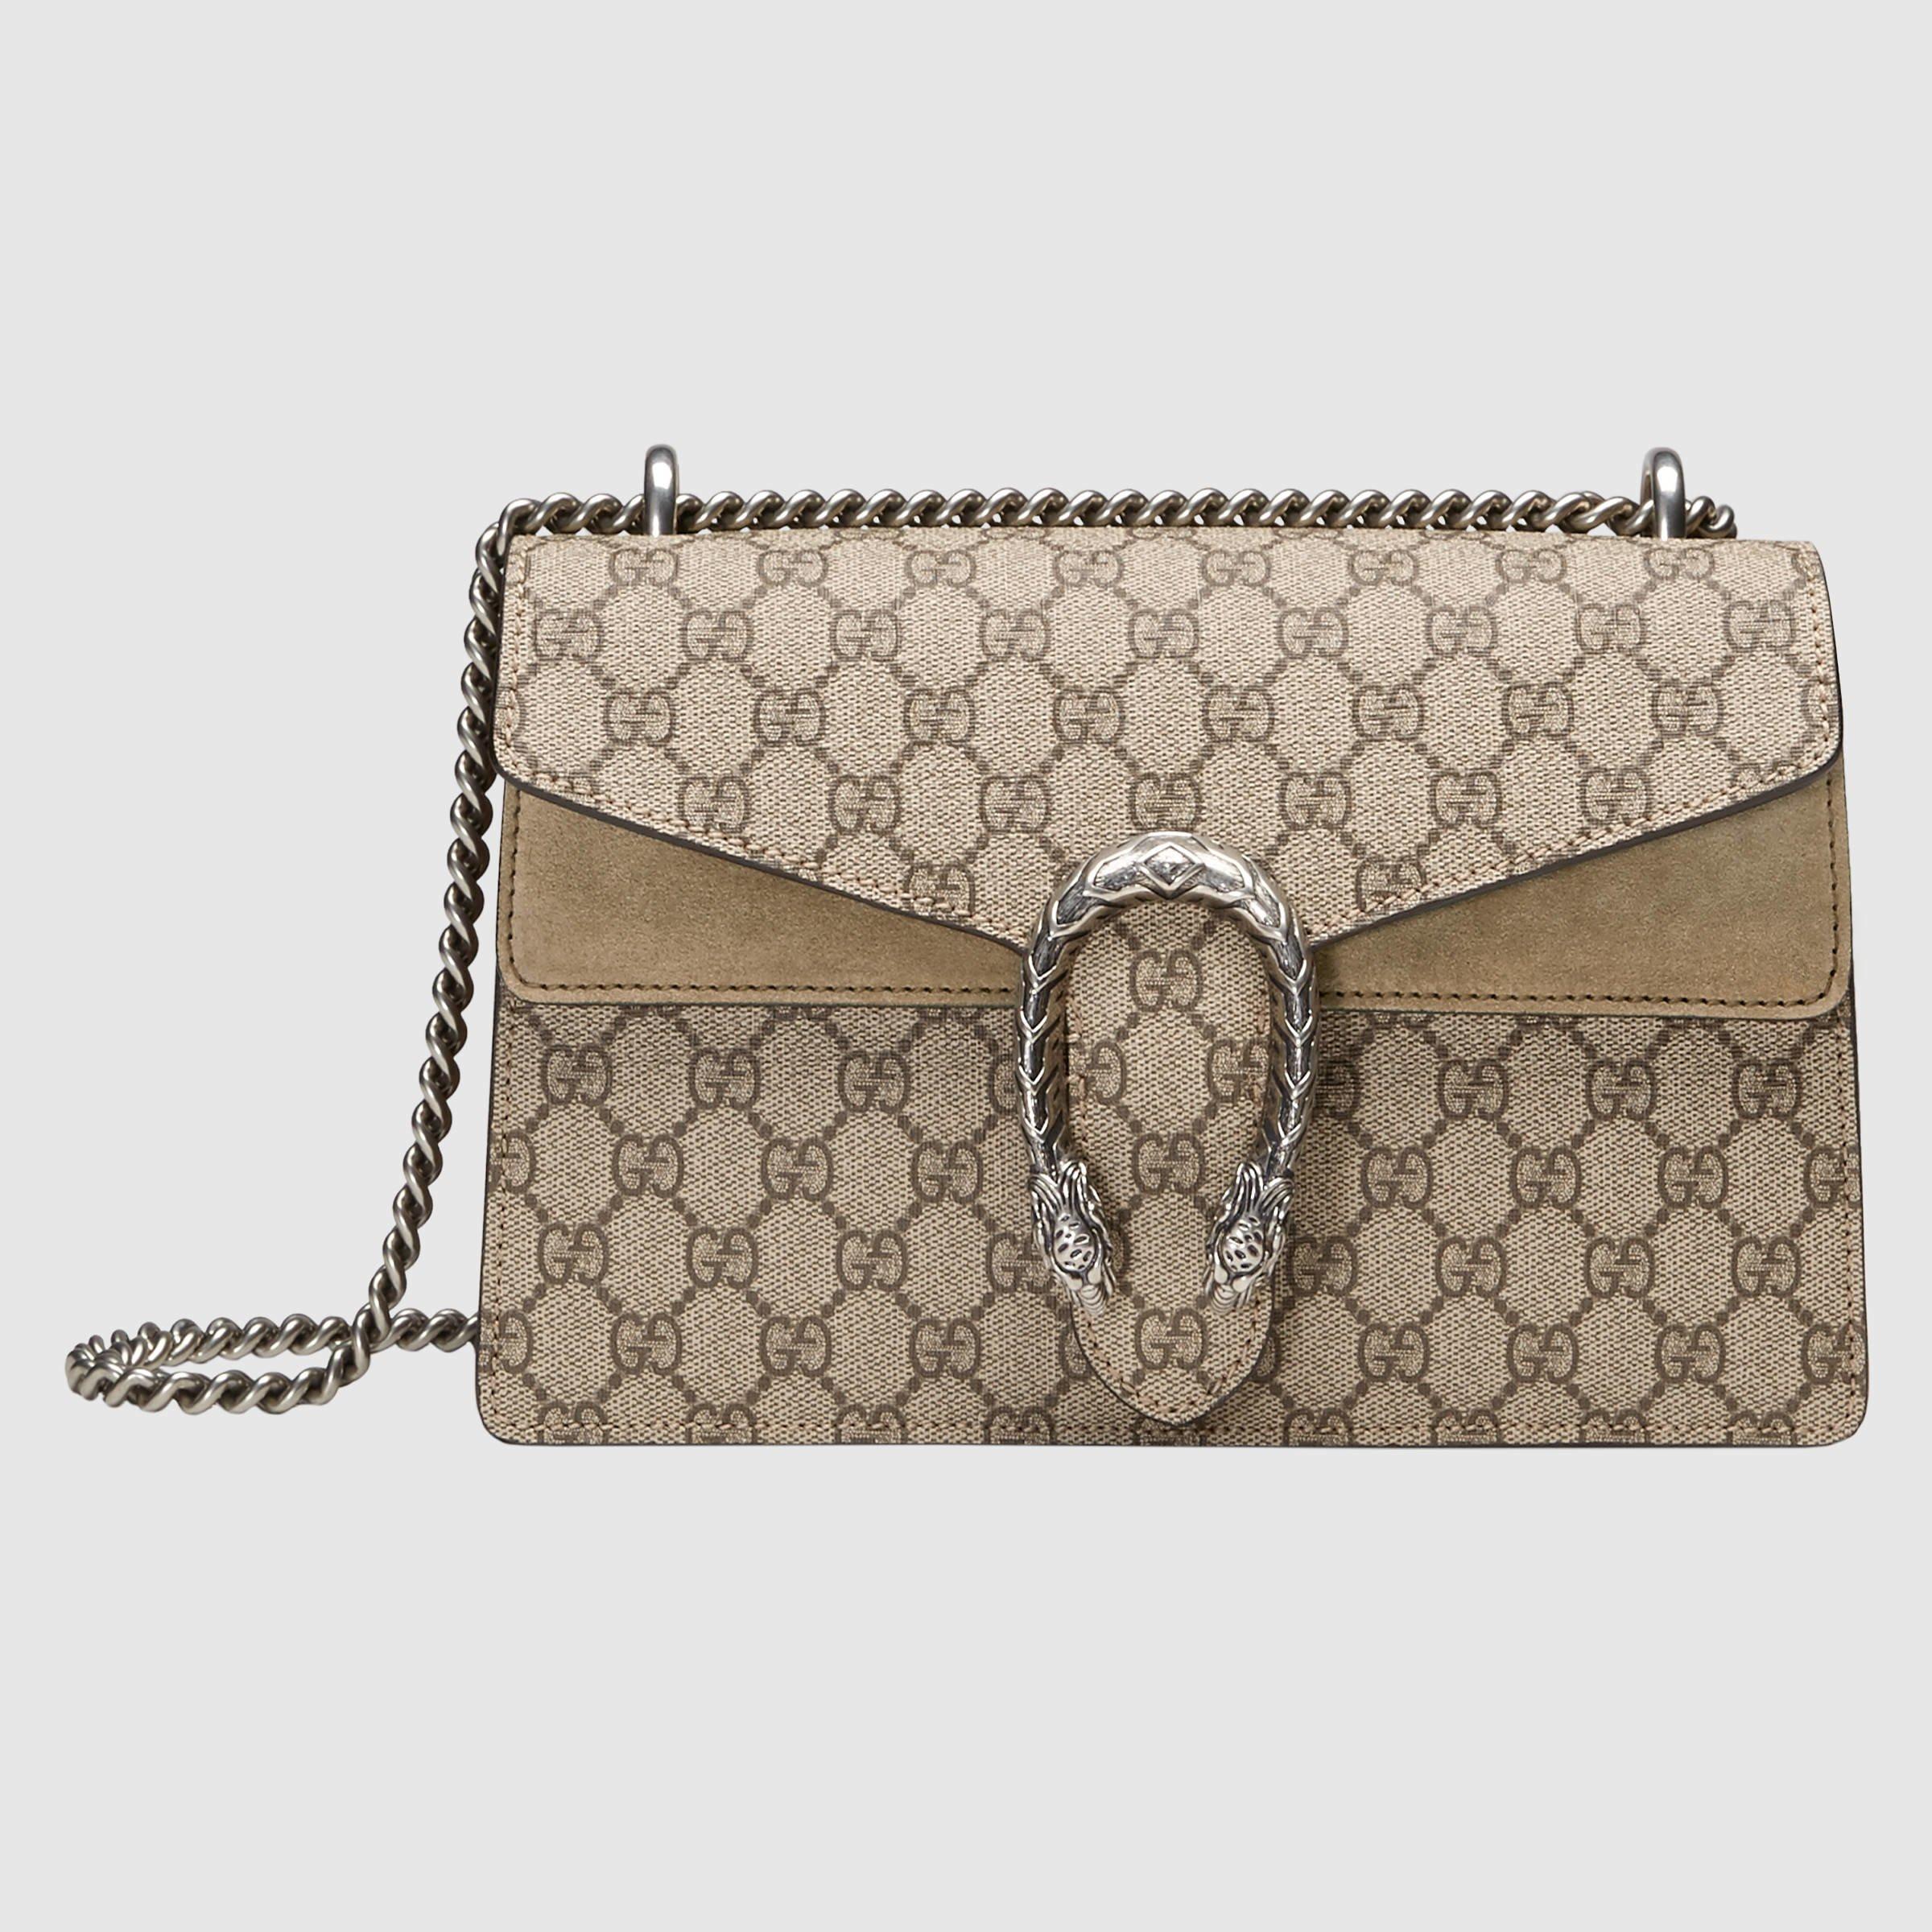 Gucci Dionysus Gg Supreme Shoulder Bag in Multicolor ...